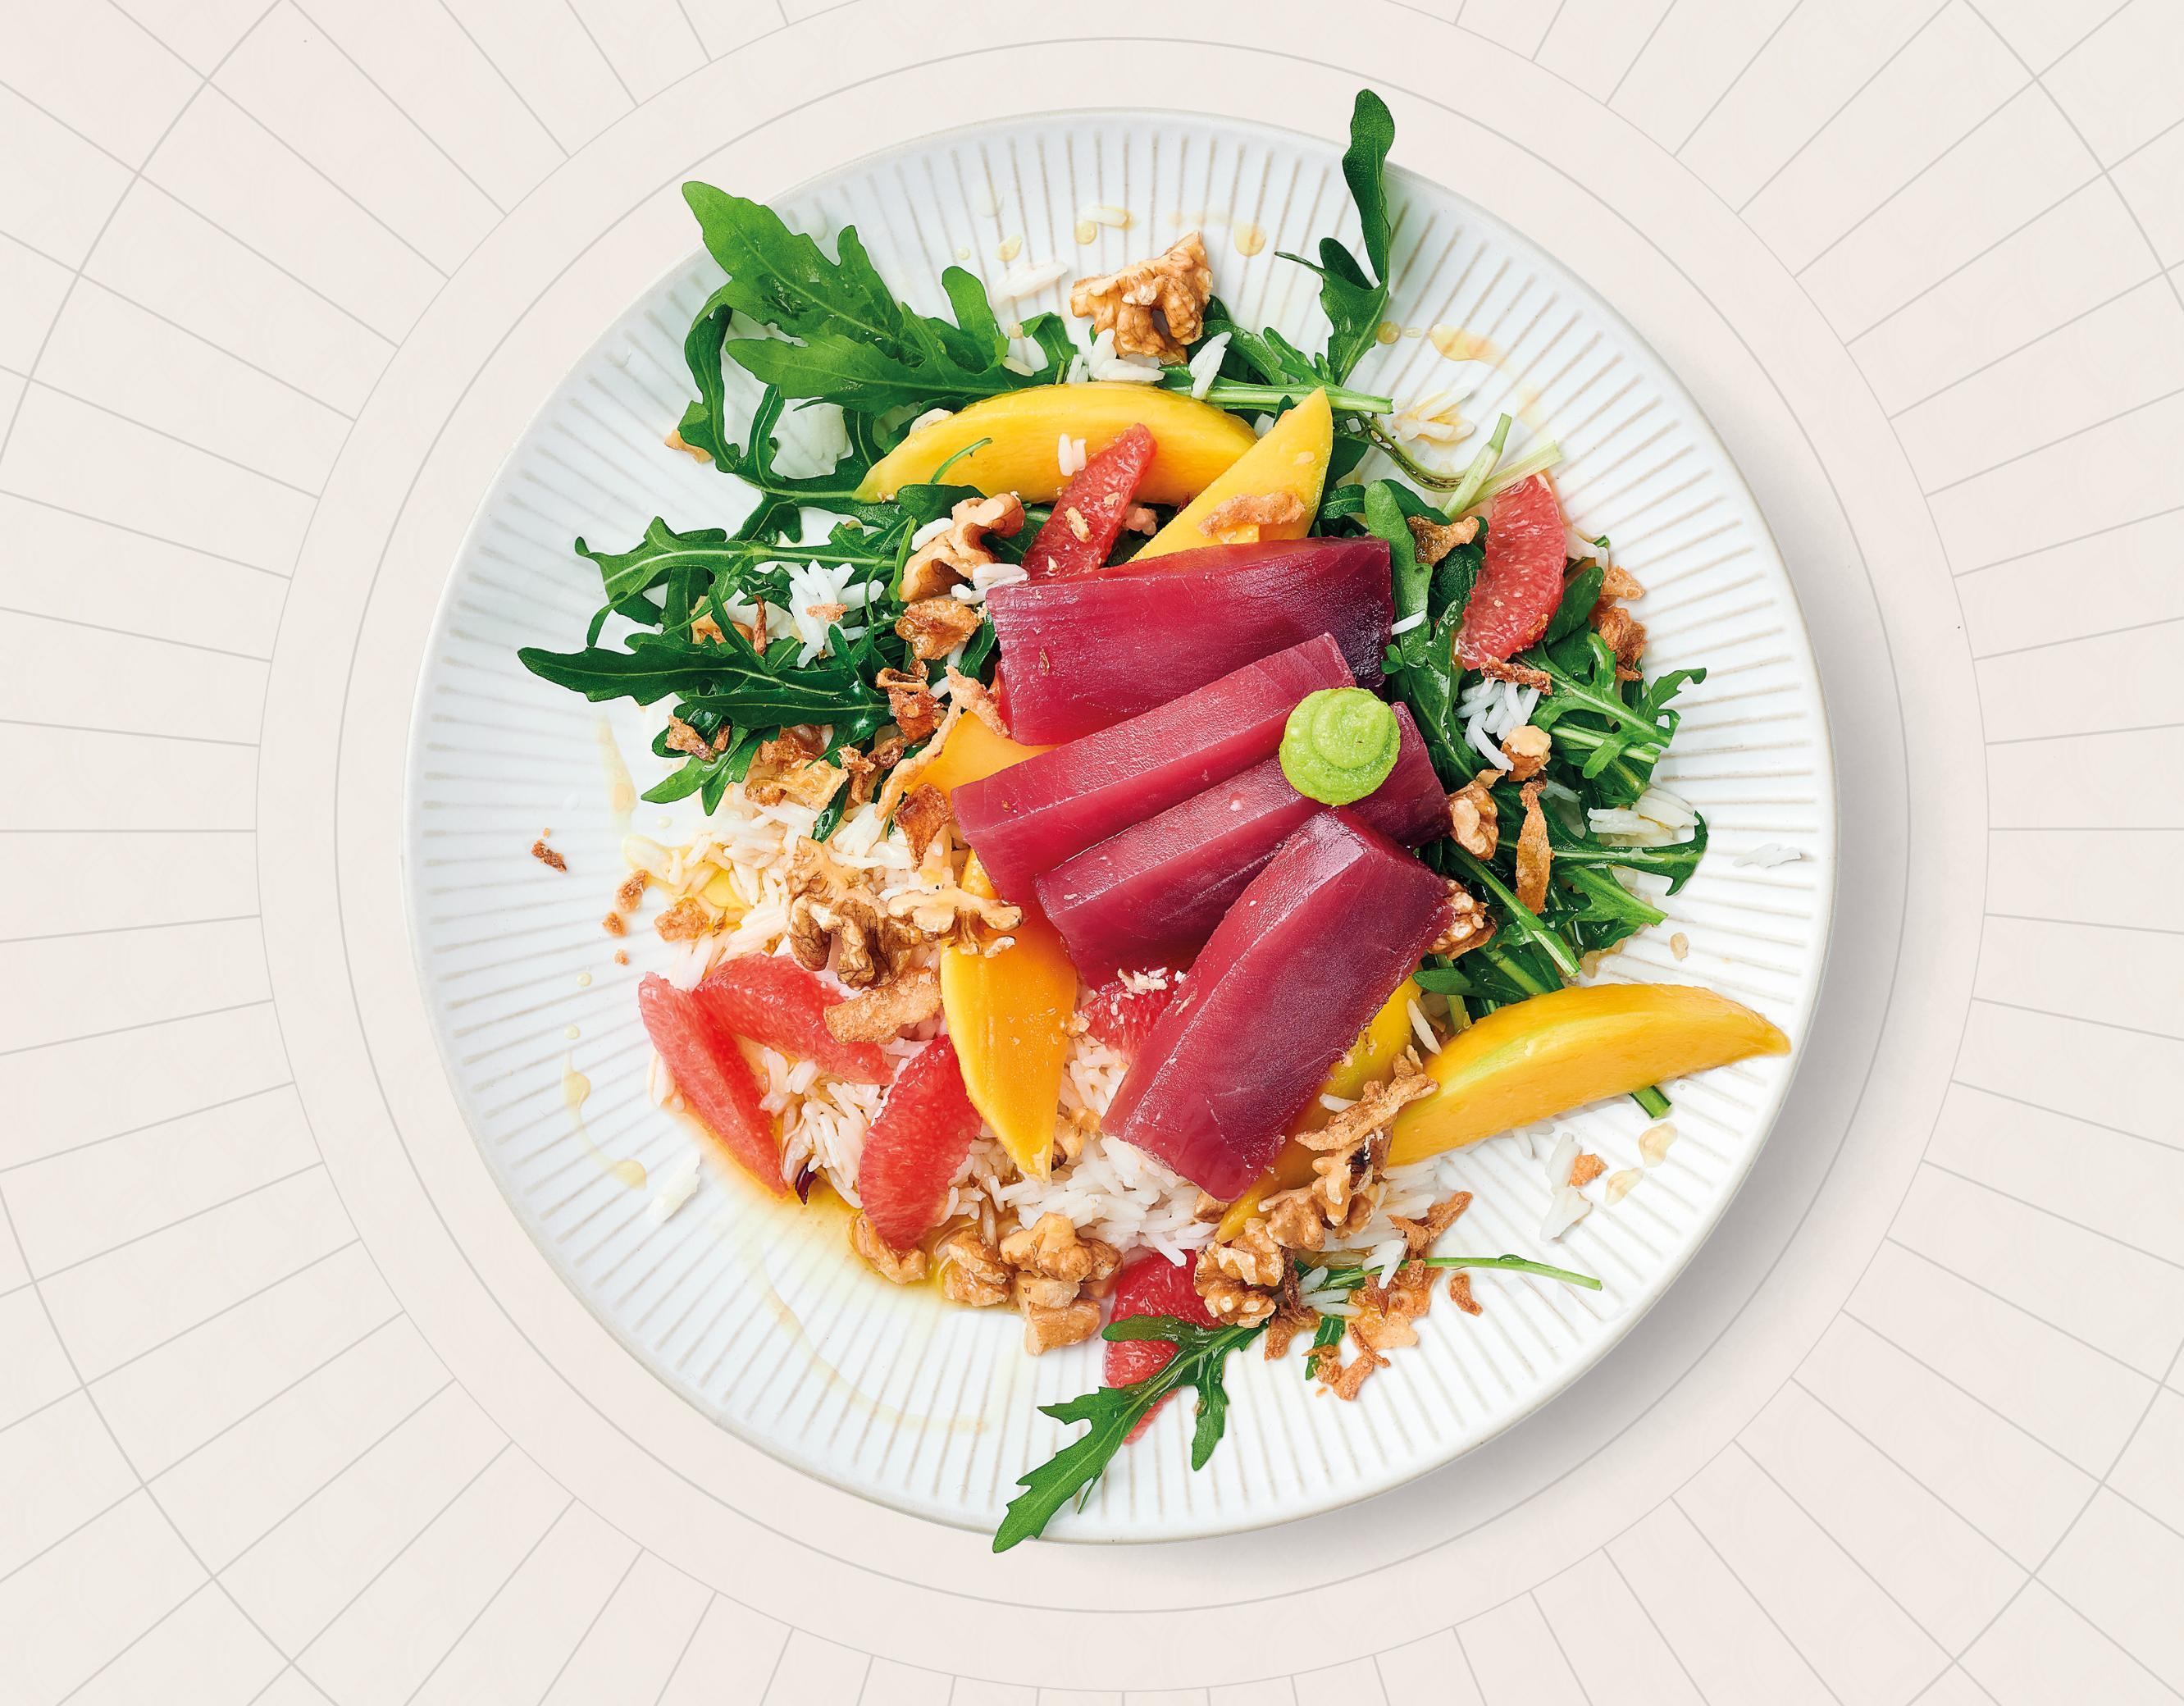 Thunfisch-Sashimi mit Mango-Grapefruit-Salat